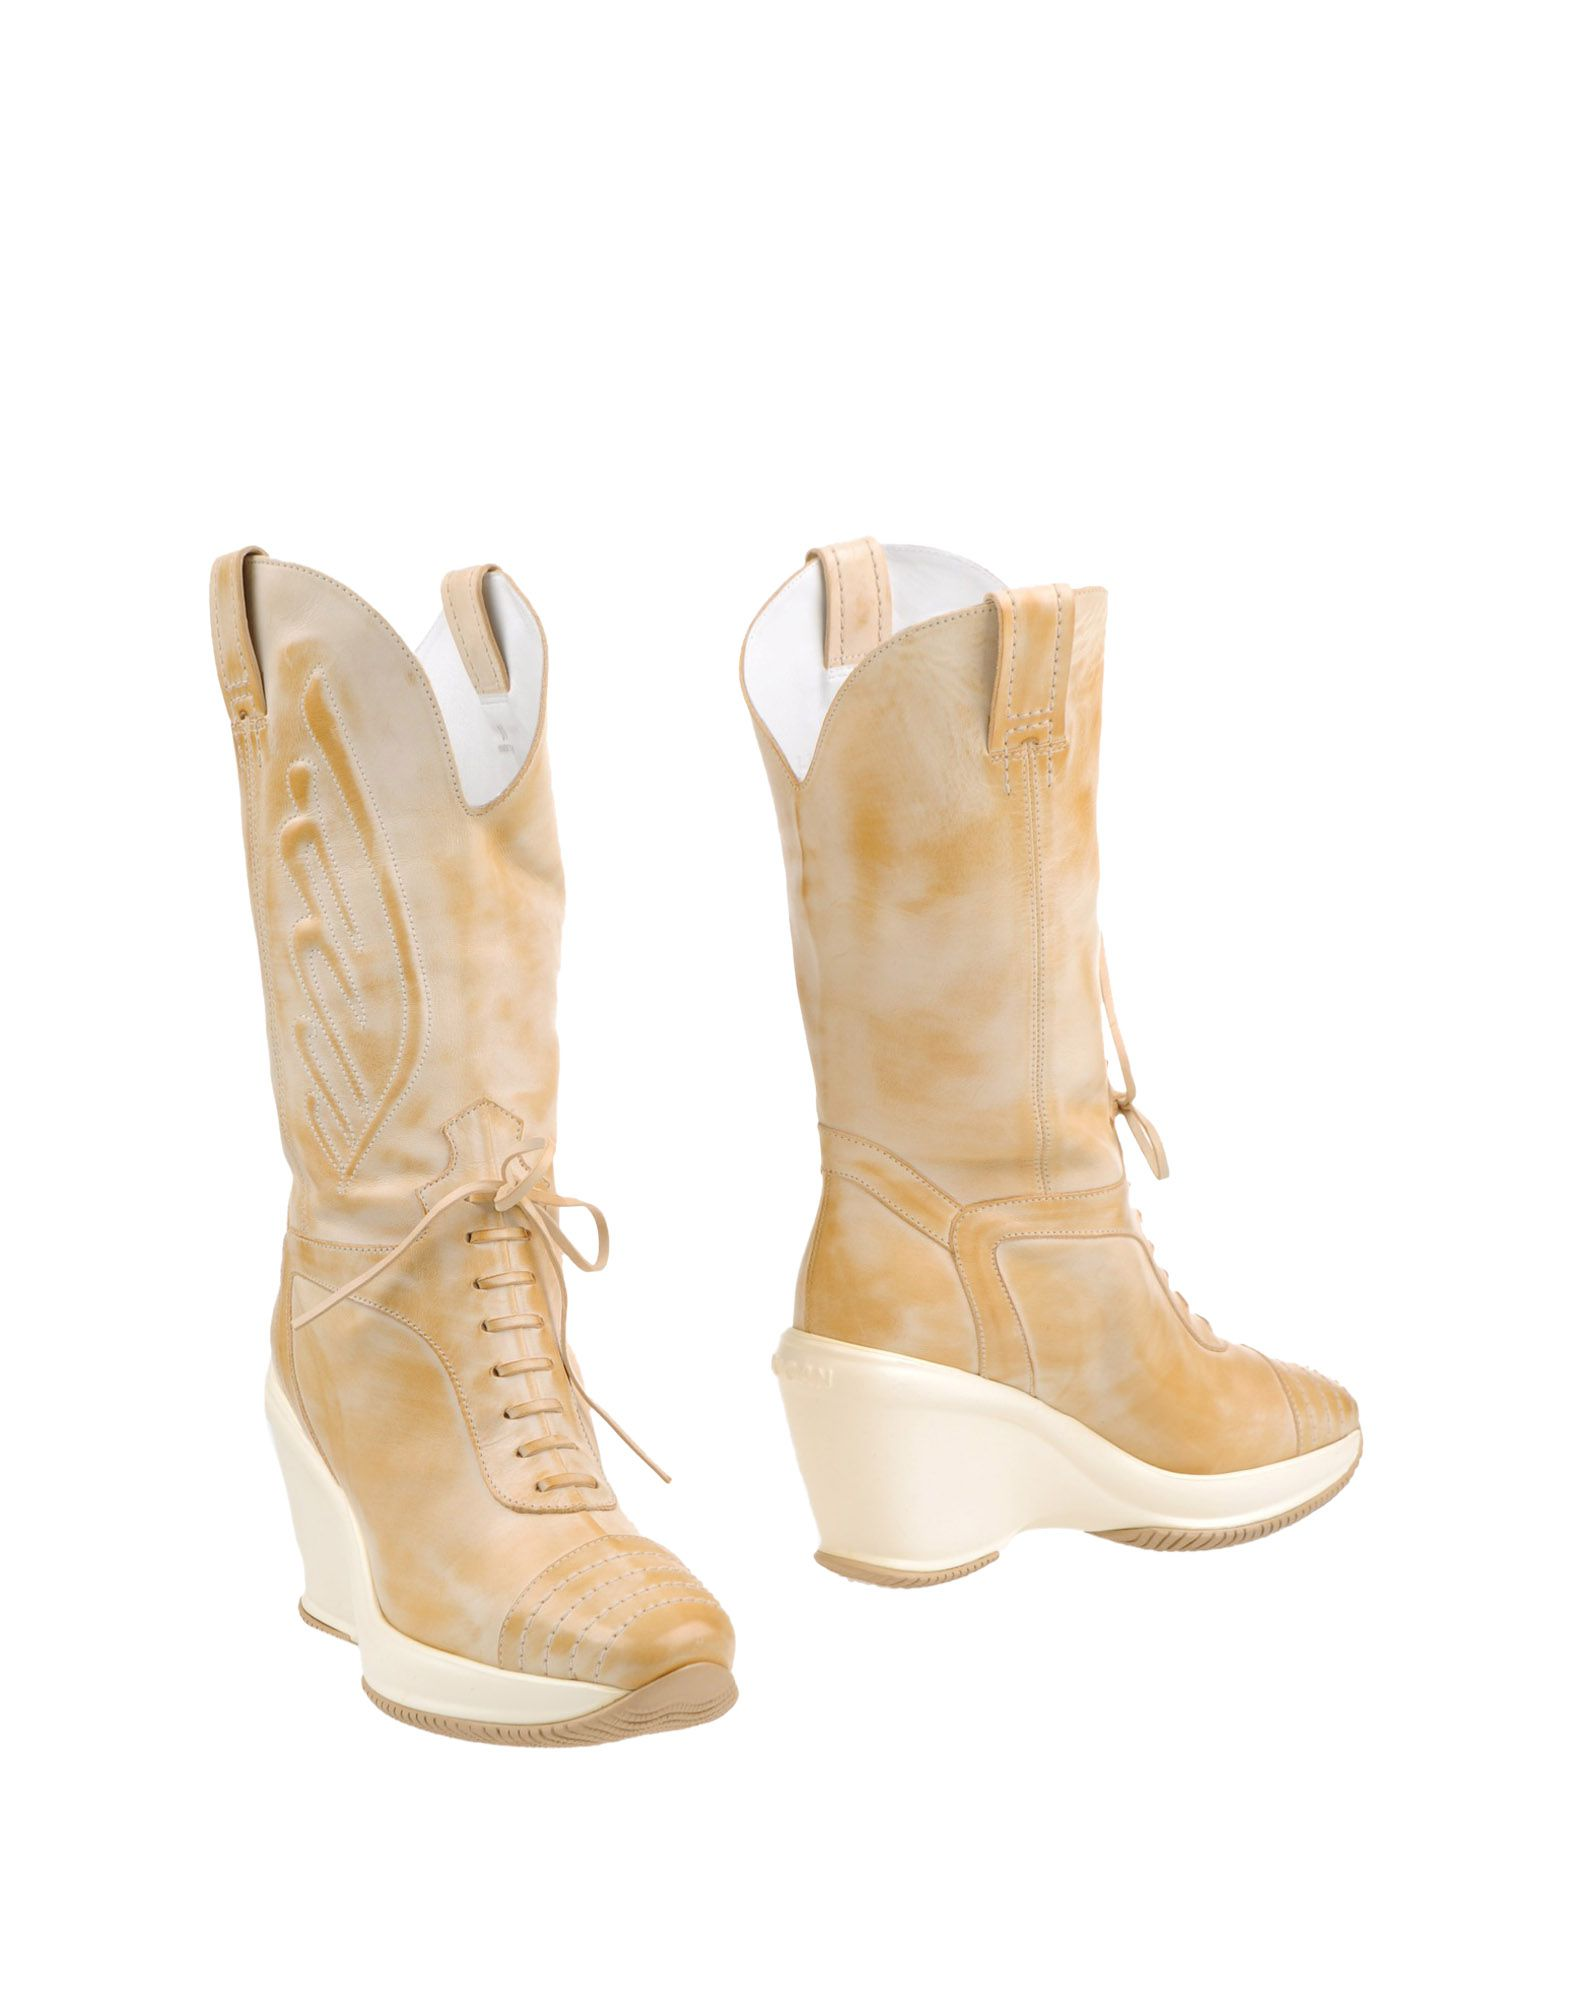 HOGAN by KARL LAGERFELD Полусапоги и высокие ботинки цены онлайн